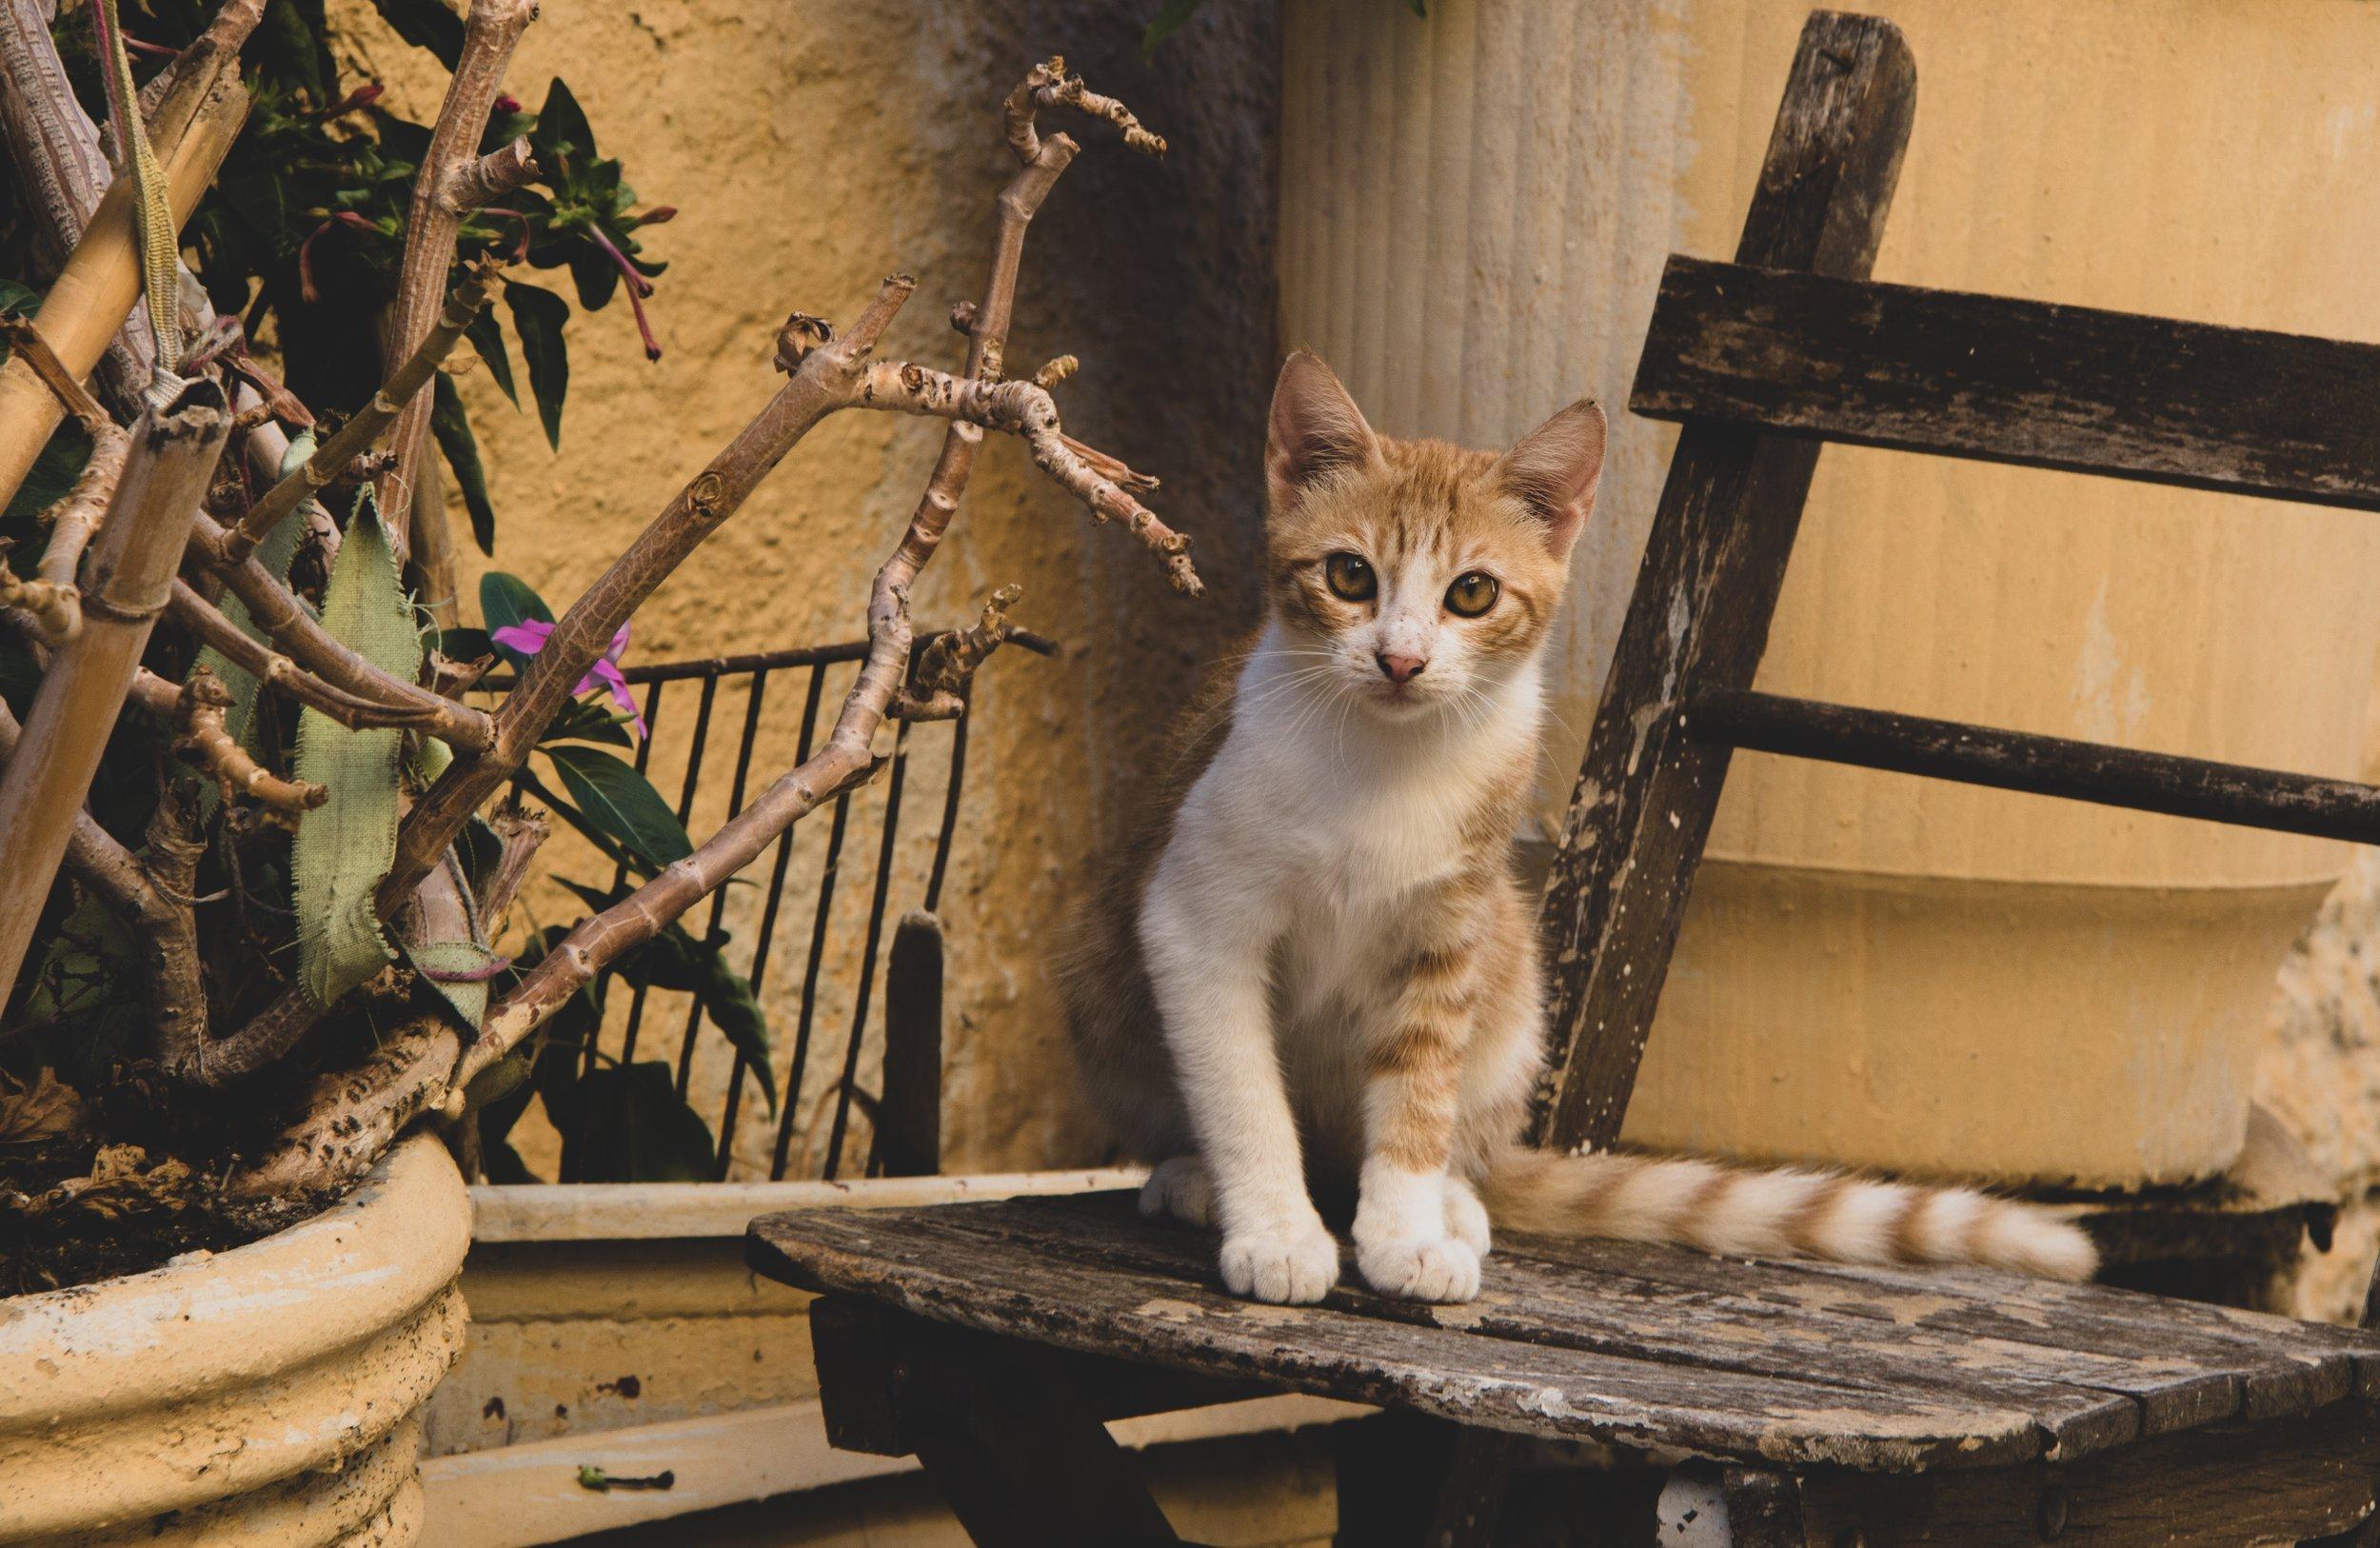 outside cat, kitten on chair #kitten #outsidekitten